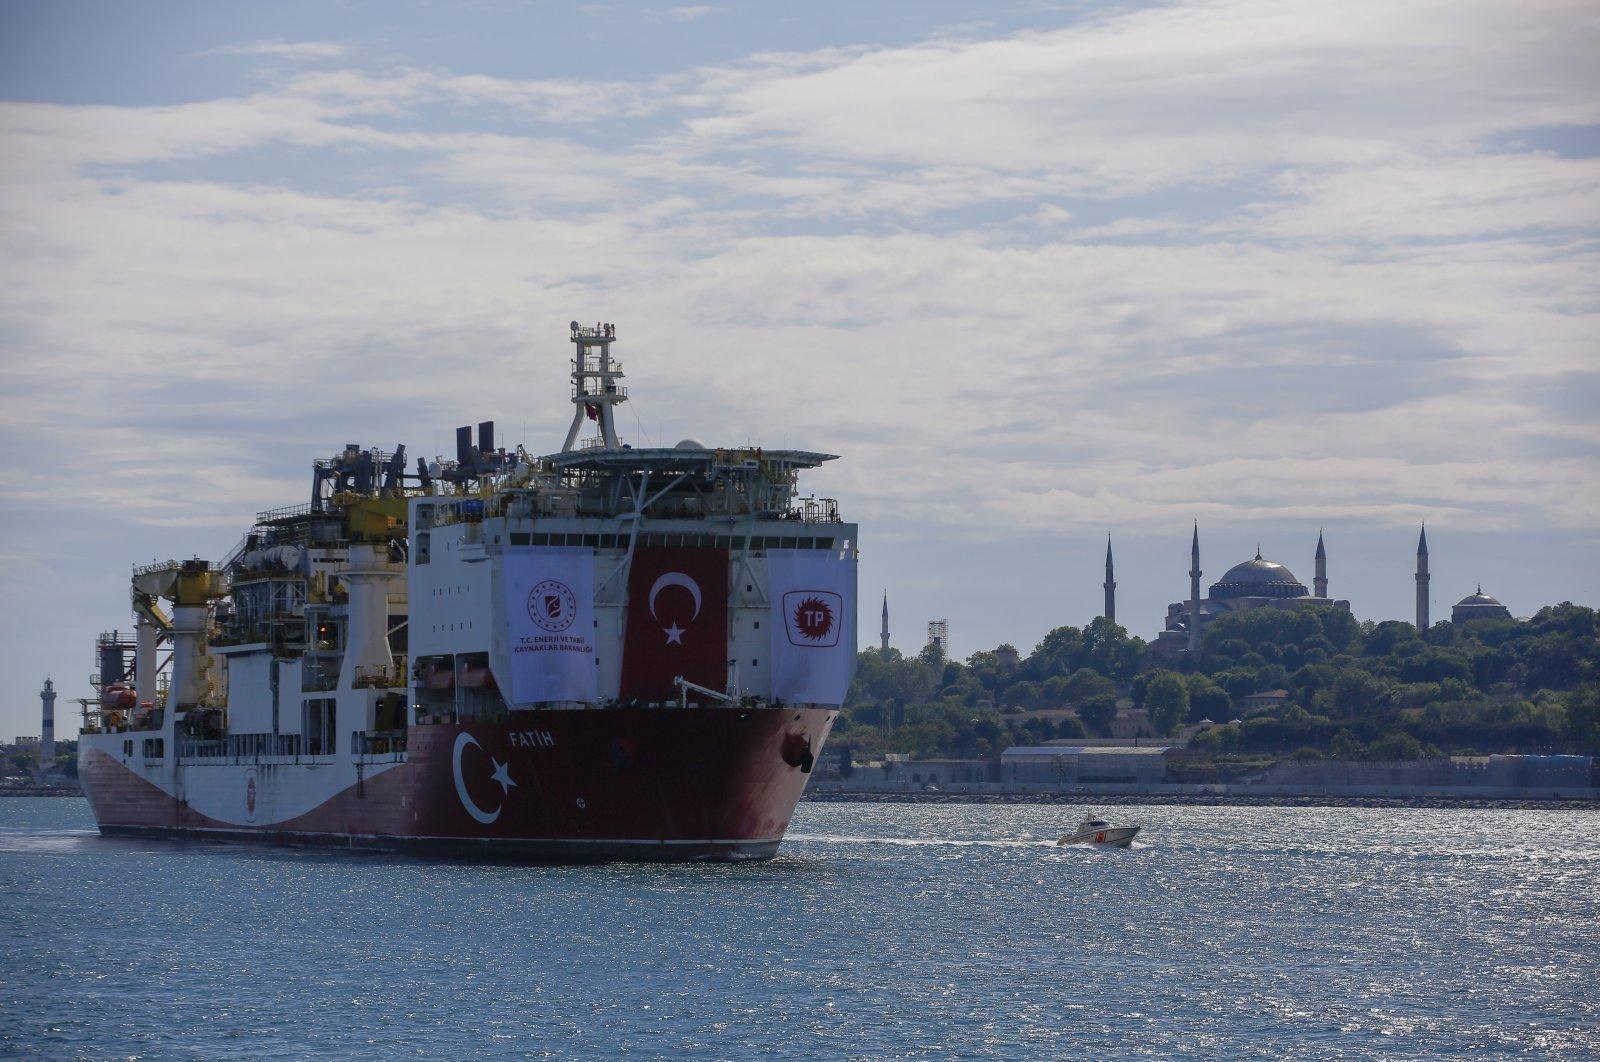 Turkey's drilling ship, Fatih, heading toward Black Sea, Istanbul, Turkey on May 29, 2020. (AP Photo)